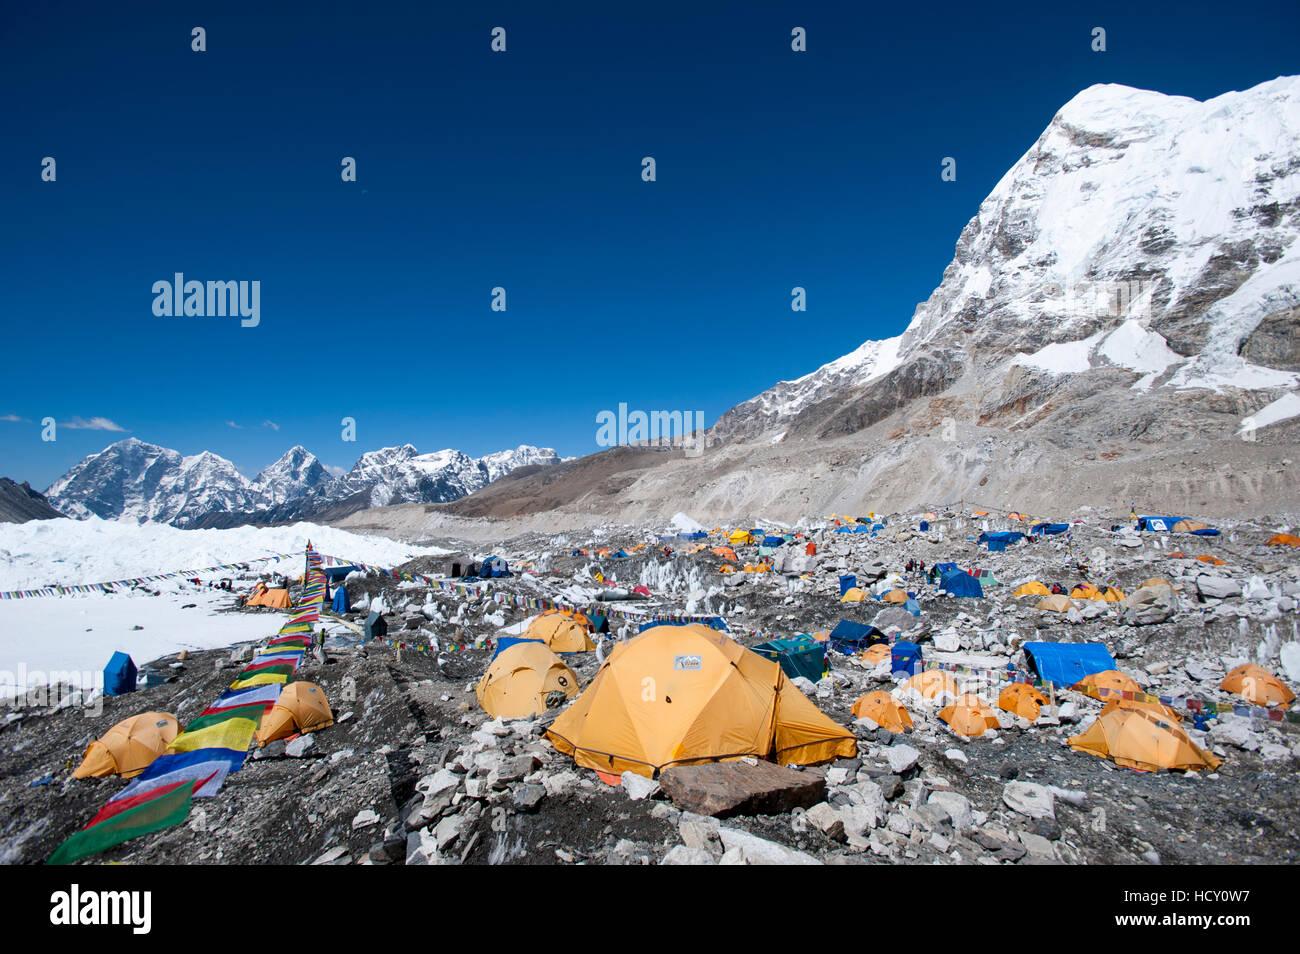 Everest Base Camp, a temporary city at 5500m on the Khumbu glacier, Khumbu Region, Nepal - Stock Image